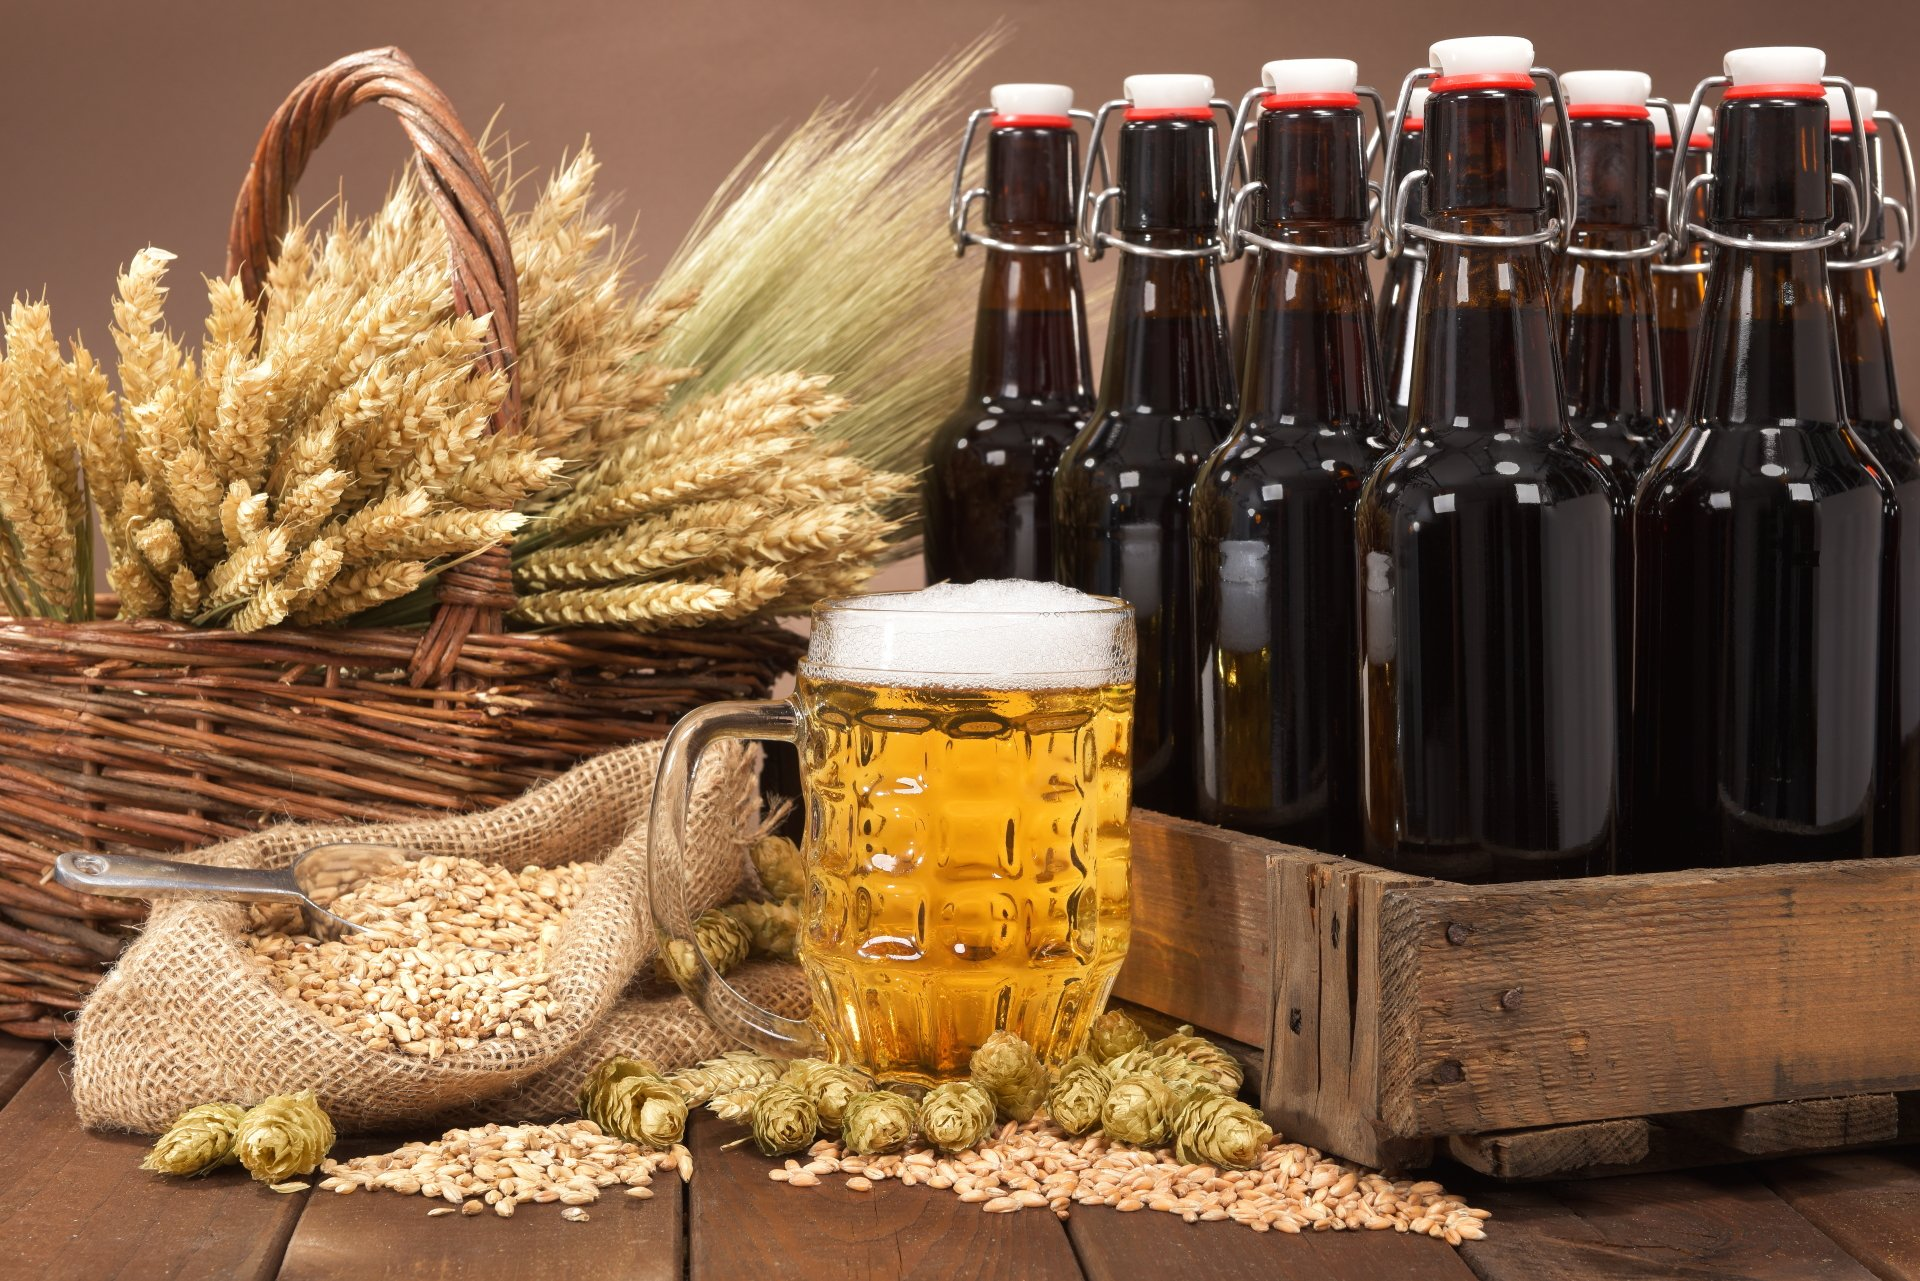 Food - Beer  Drink Alcohol Bottle Still Life Glass Wallpaper